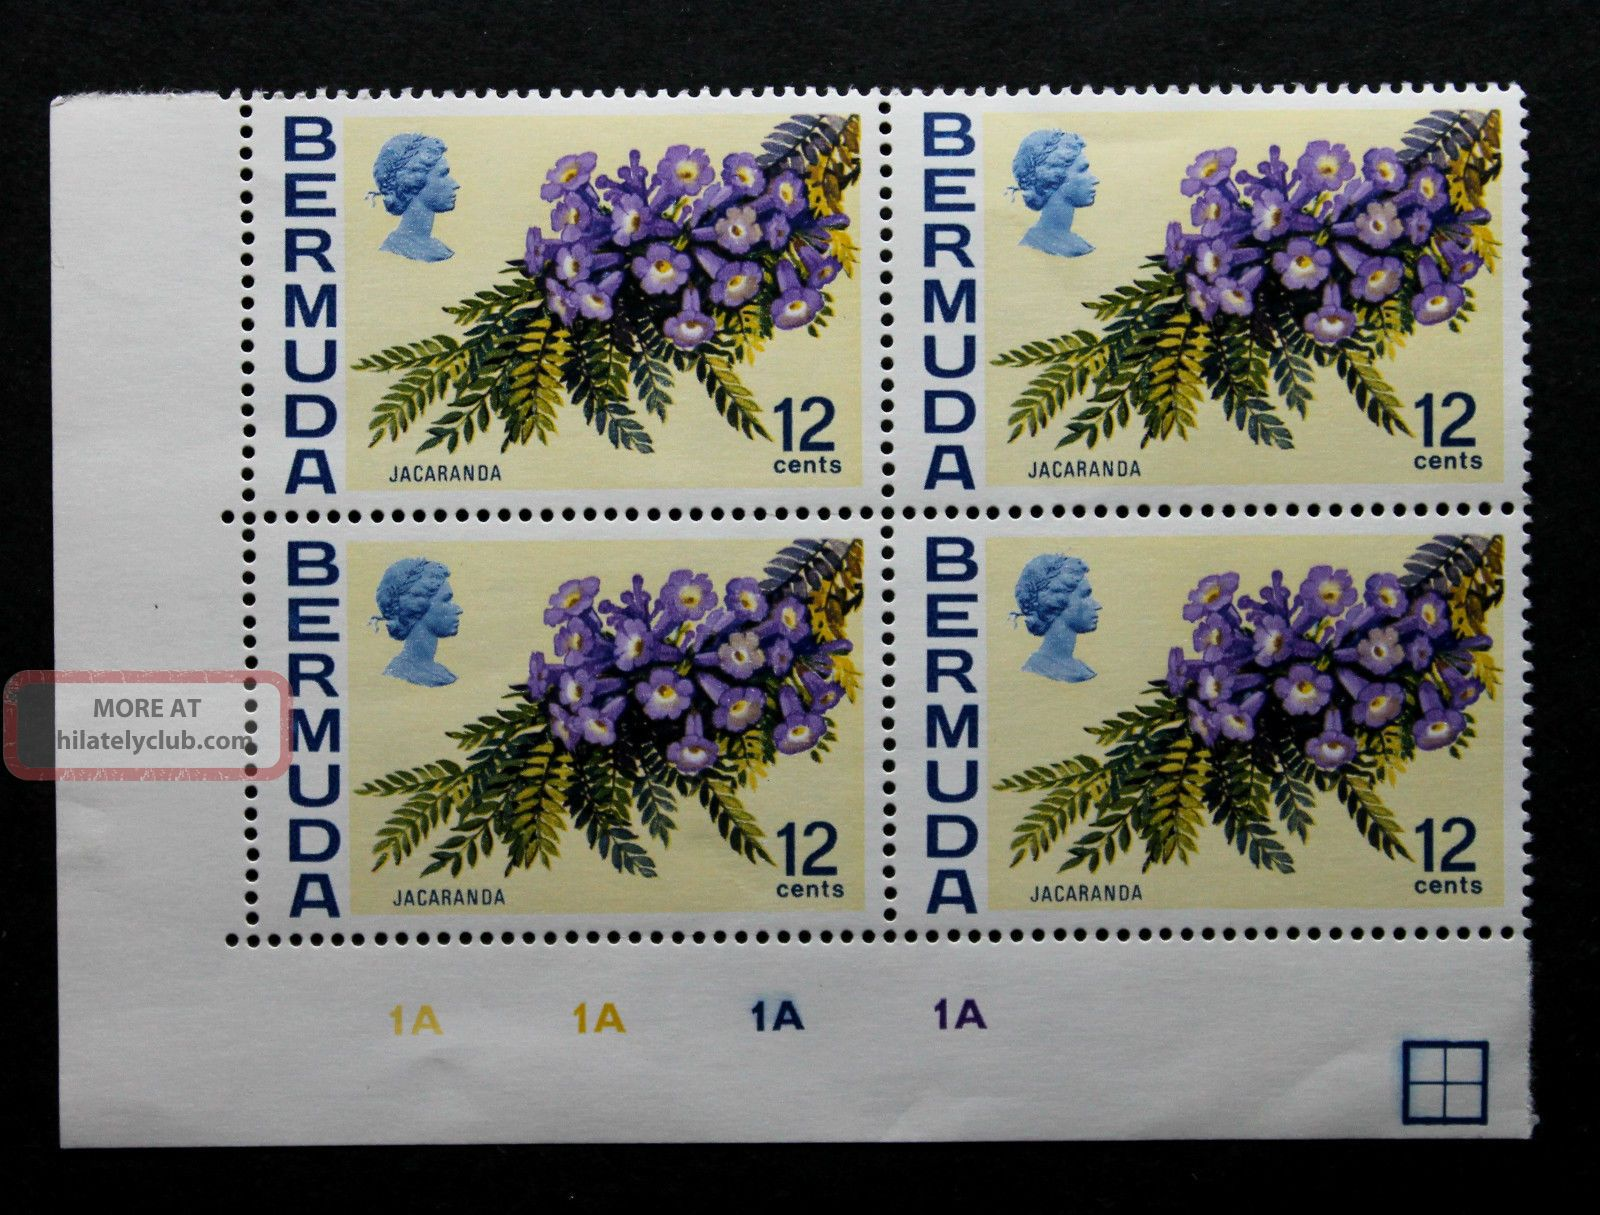 Stamp Bermuda Sc 263a Wm Up Control Block 1a Block Of 4 British Colonies & Territories photo